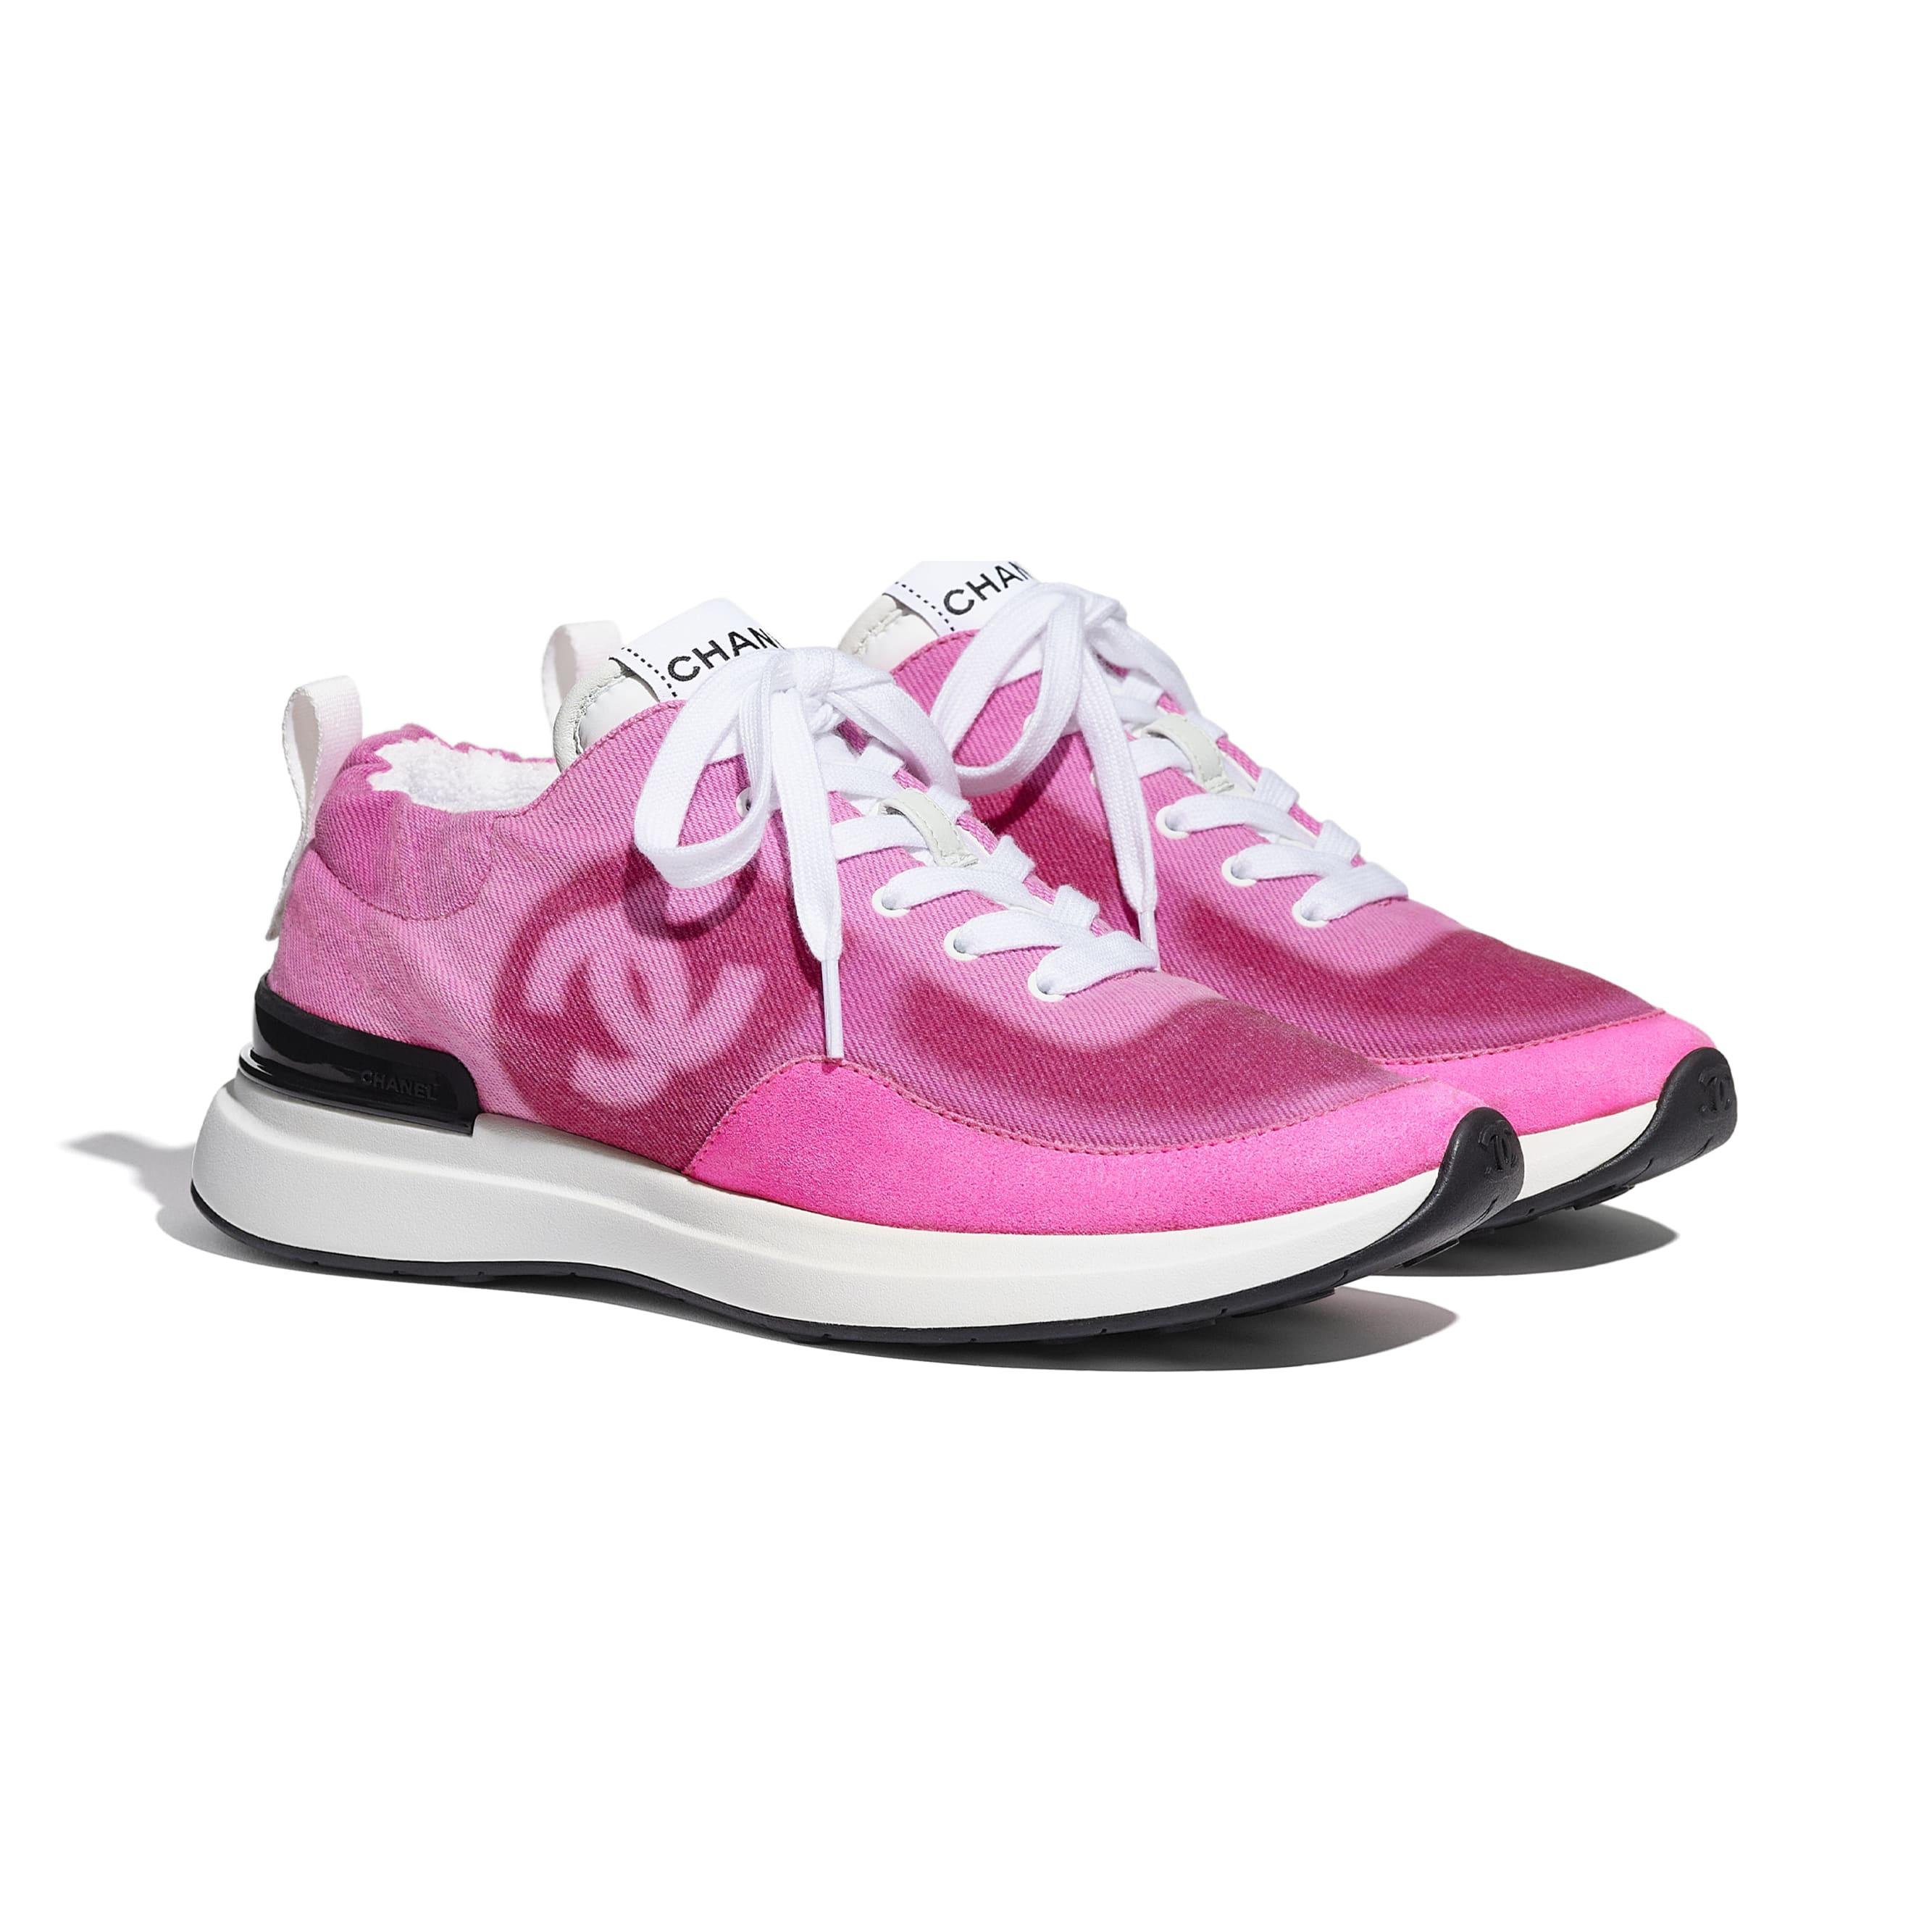 Trainers - Neon Pink - Denim & Suede Calfskin - CHANEL - Alternative view - see standard sized version